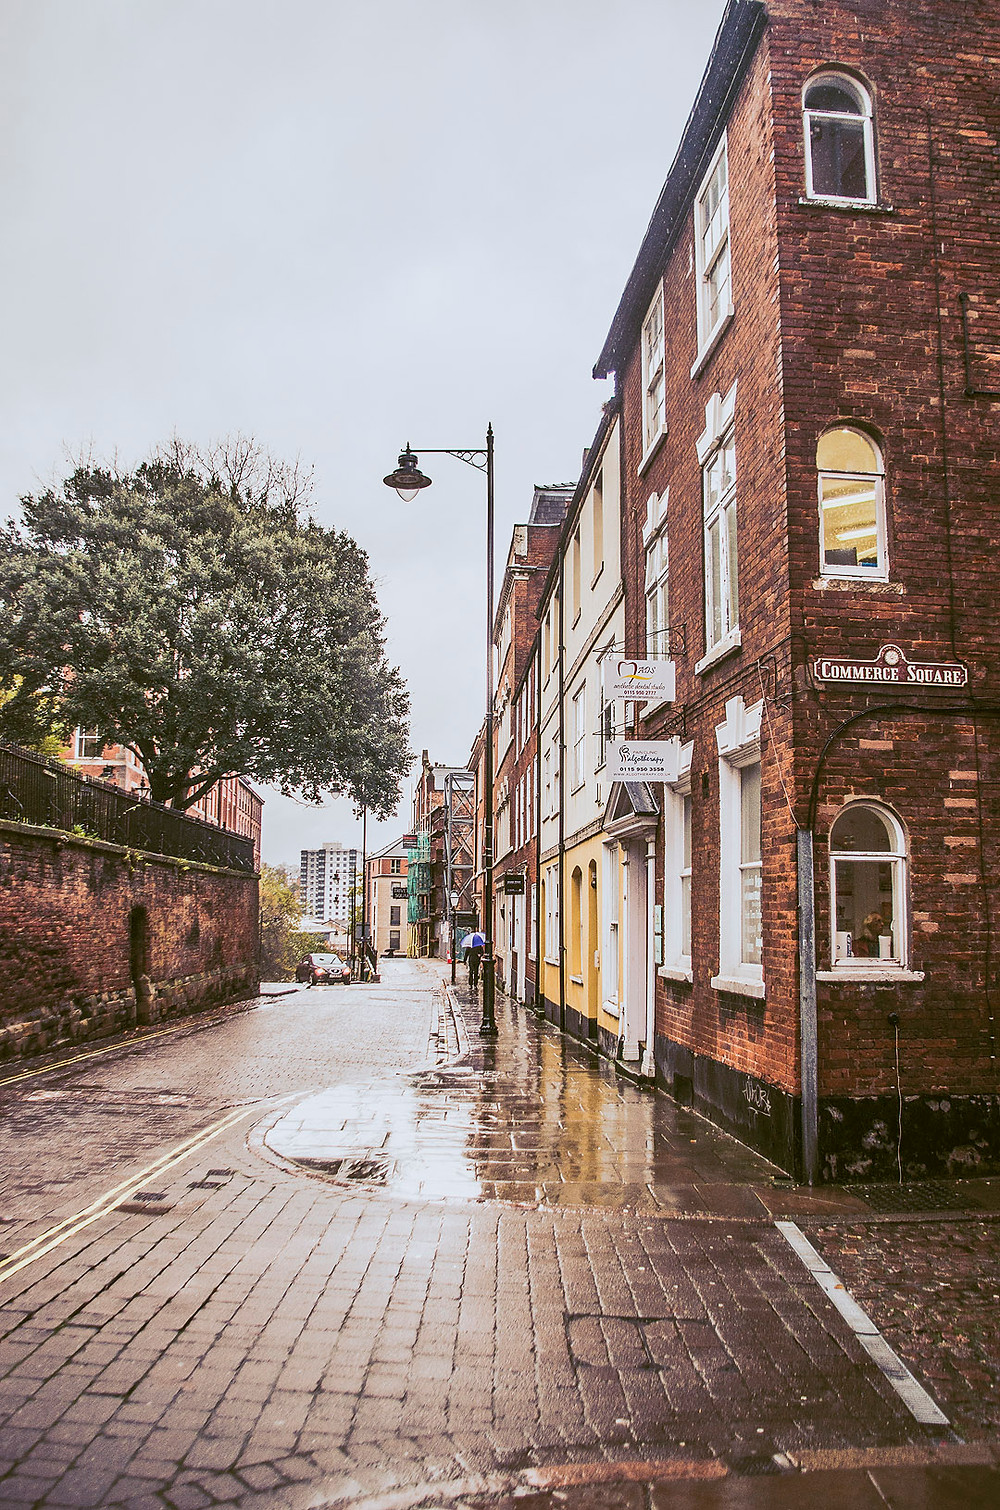 Commerce Square Nottingham